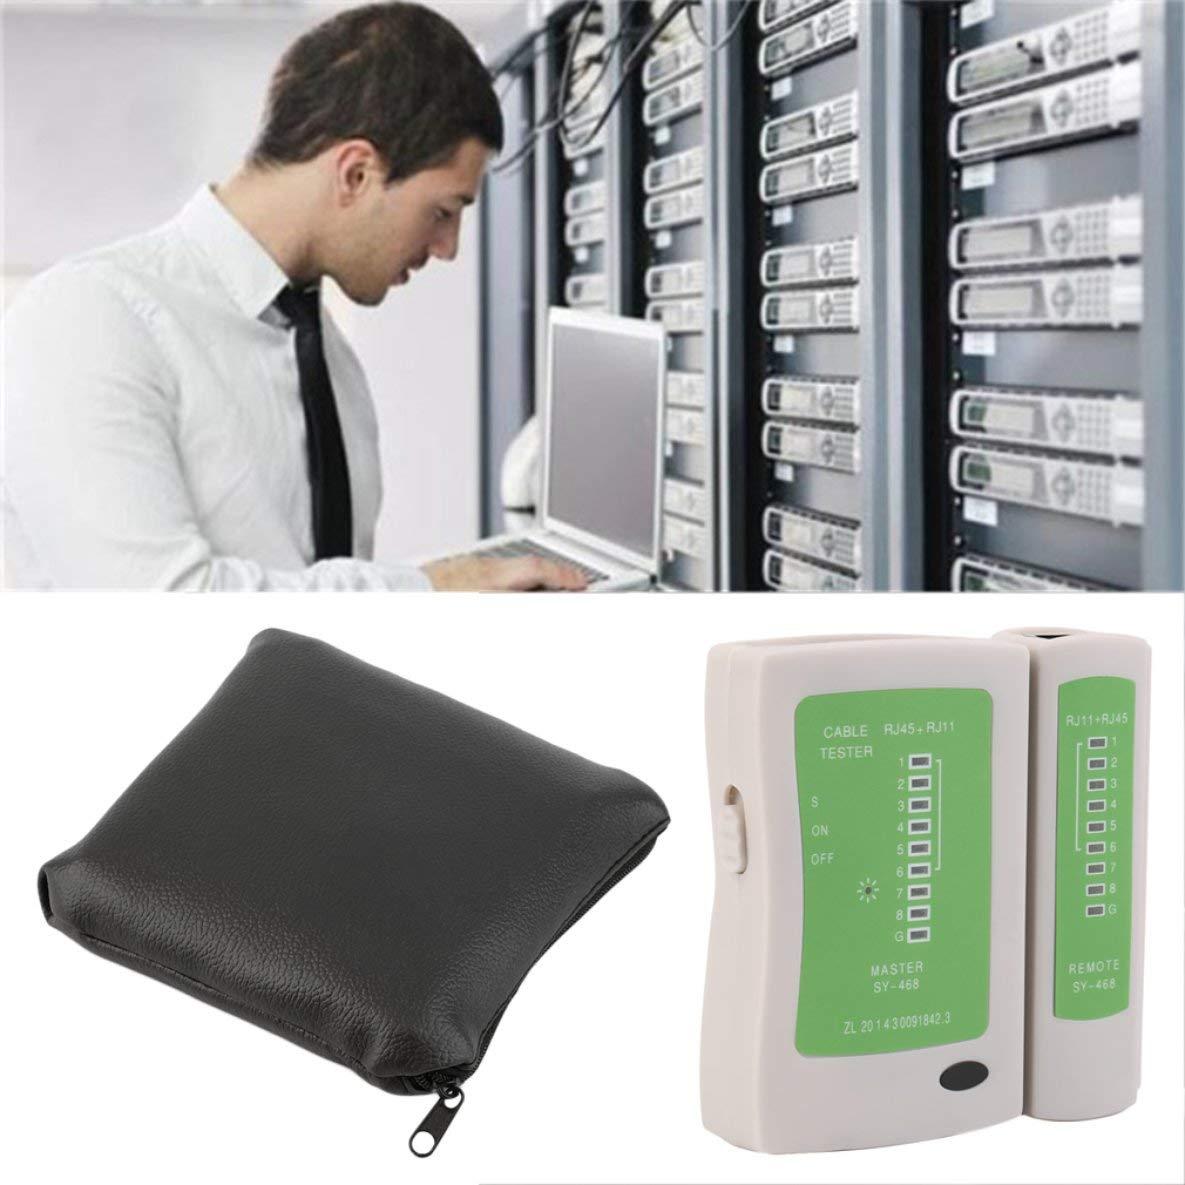 Noradtjcca RJ45 RJ11 RJ12 CAT5 UTP Network LAN USB Cable Tester Detector Remote Test Tools Networking Tool